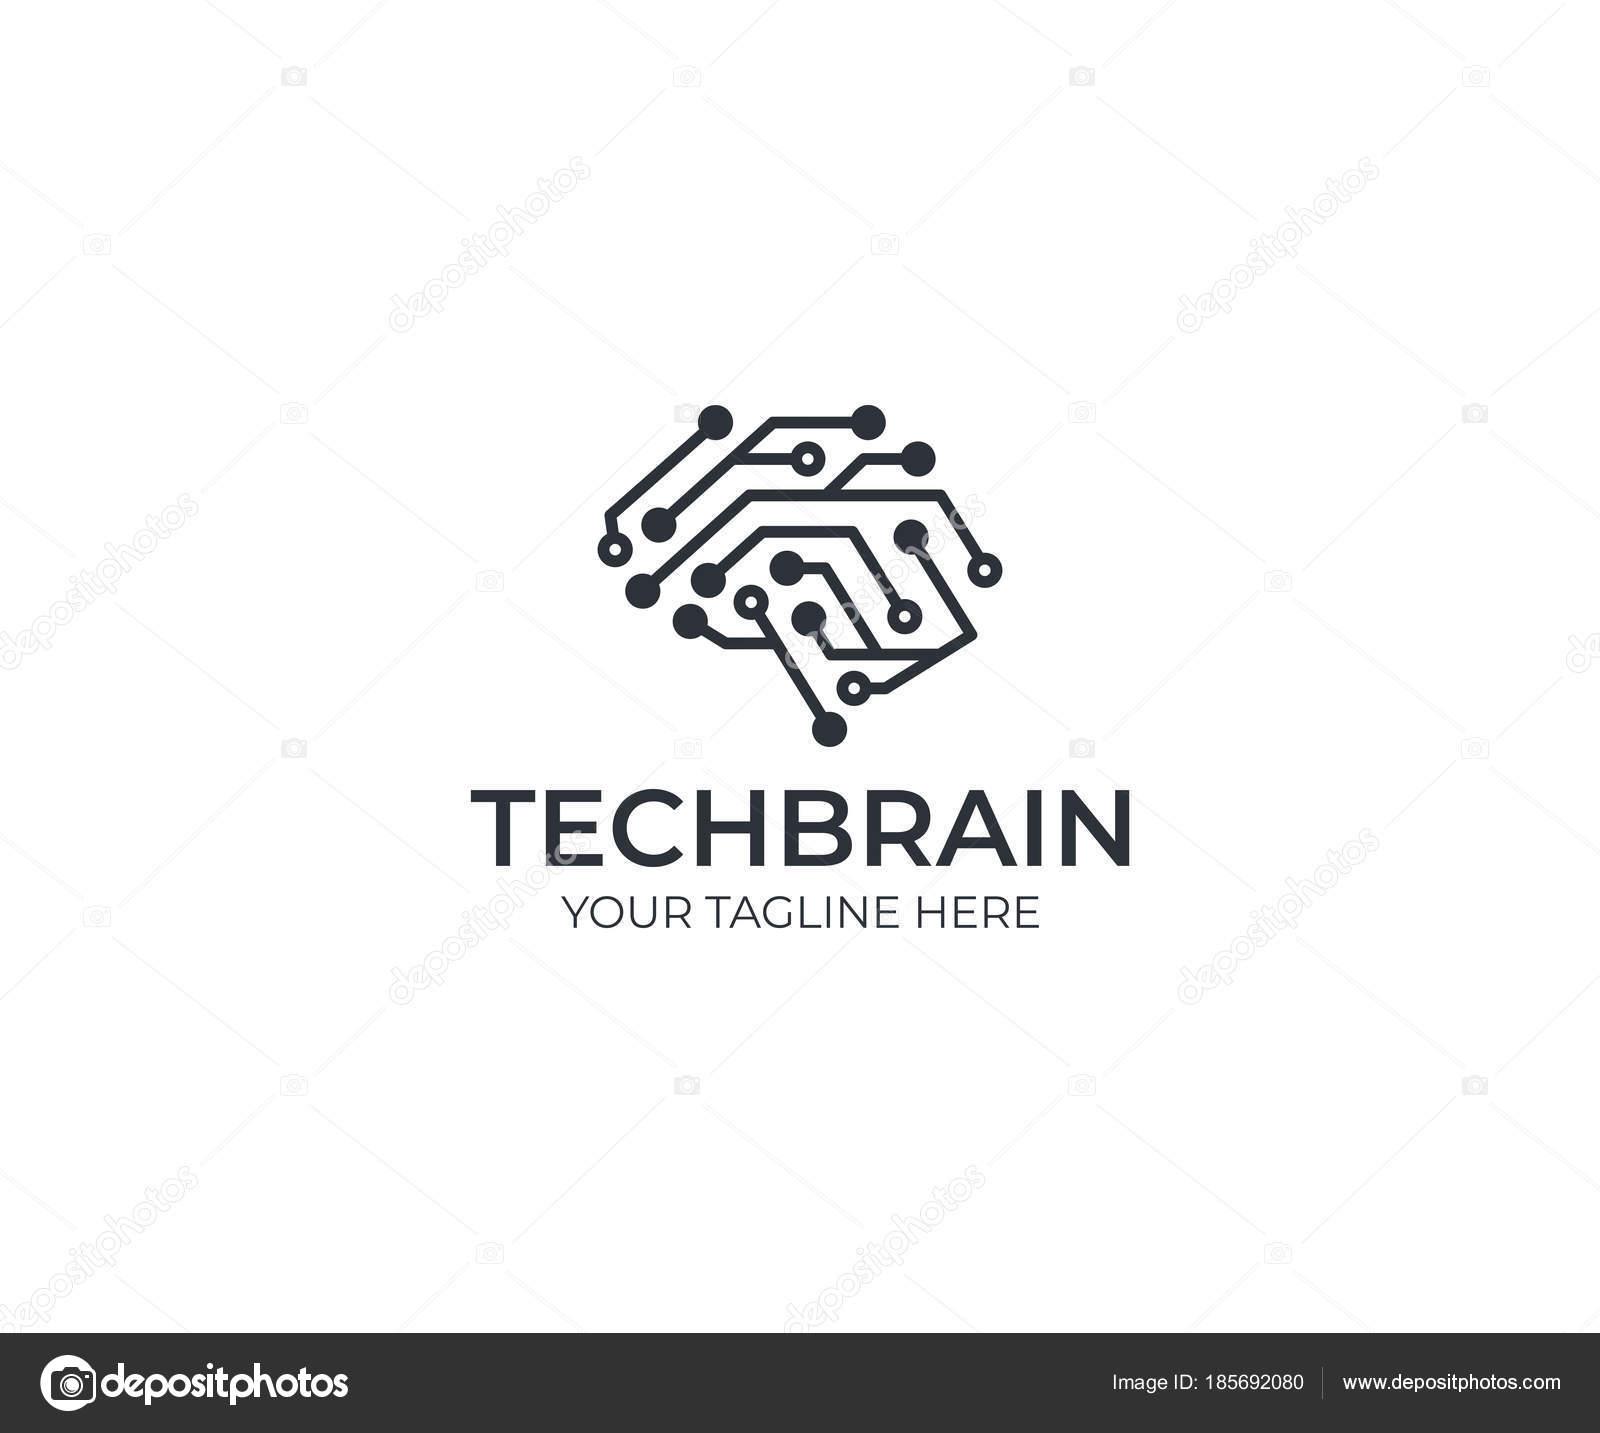 modelo logotipo circuito cerebral desenho vetor intelig u00eancia artificial humano ilustra u00e7 u00e3o